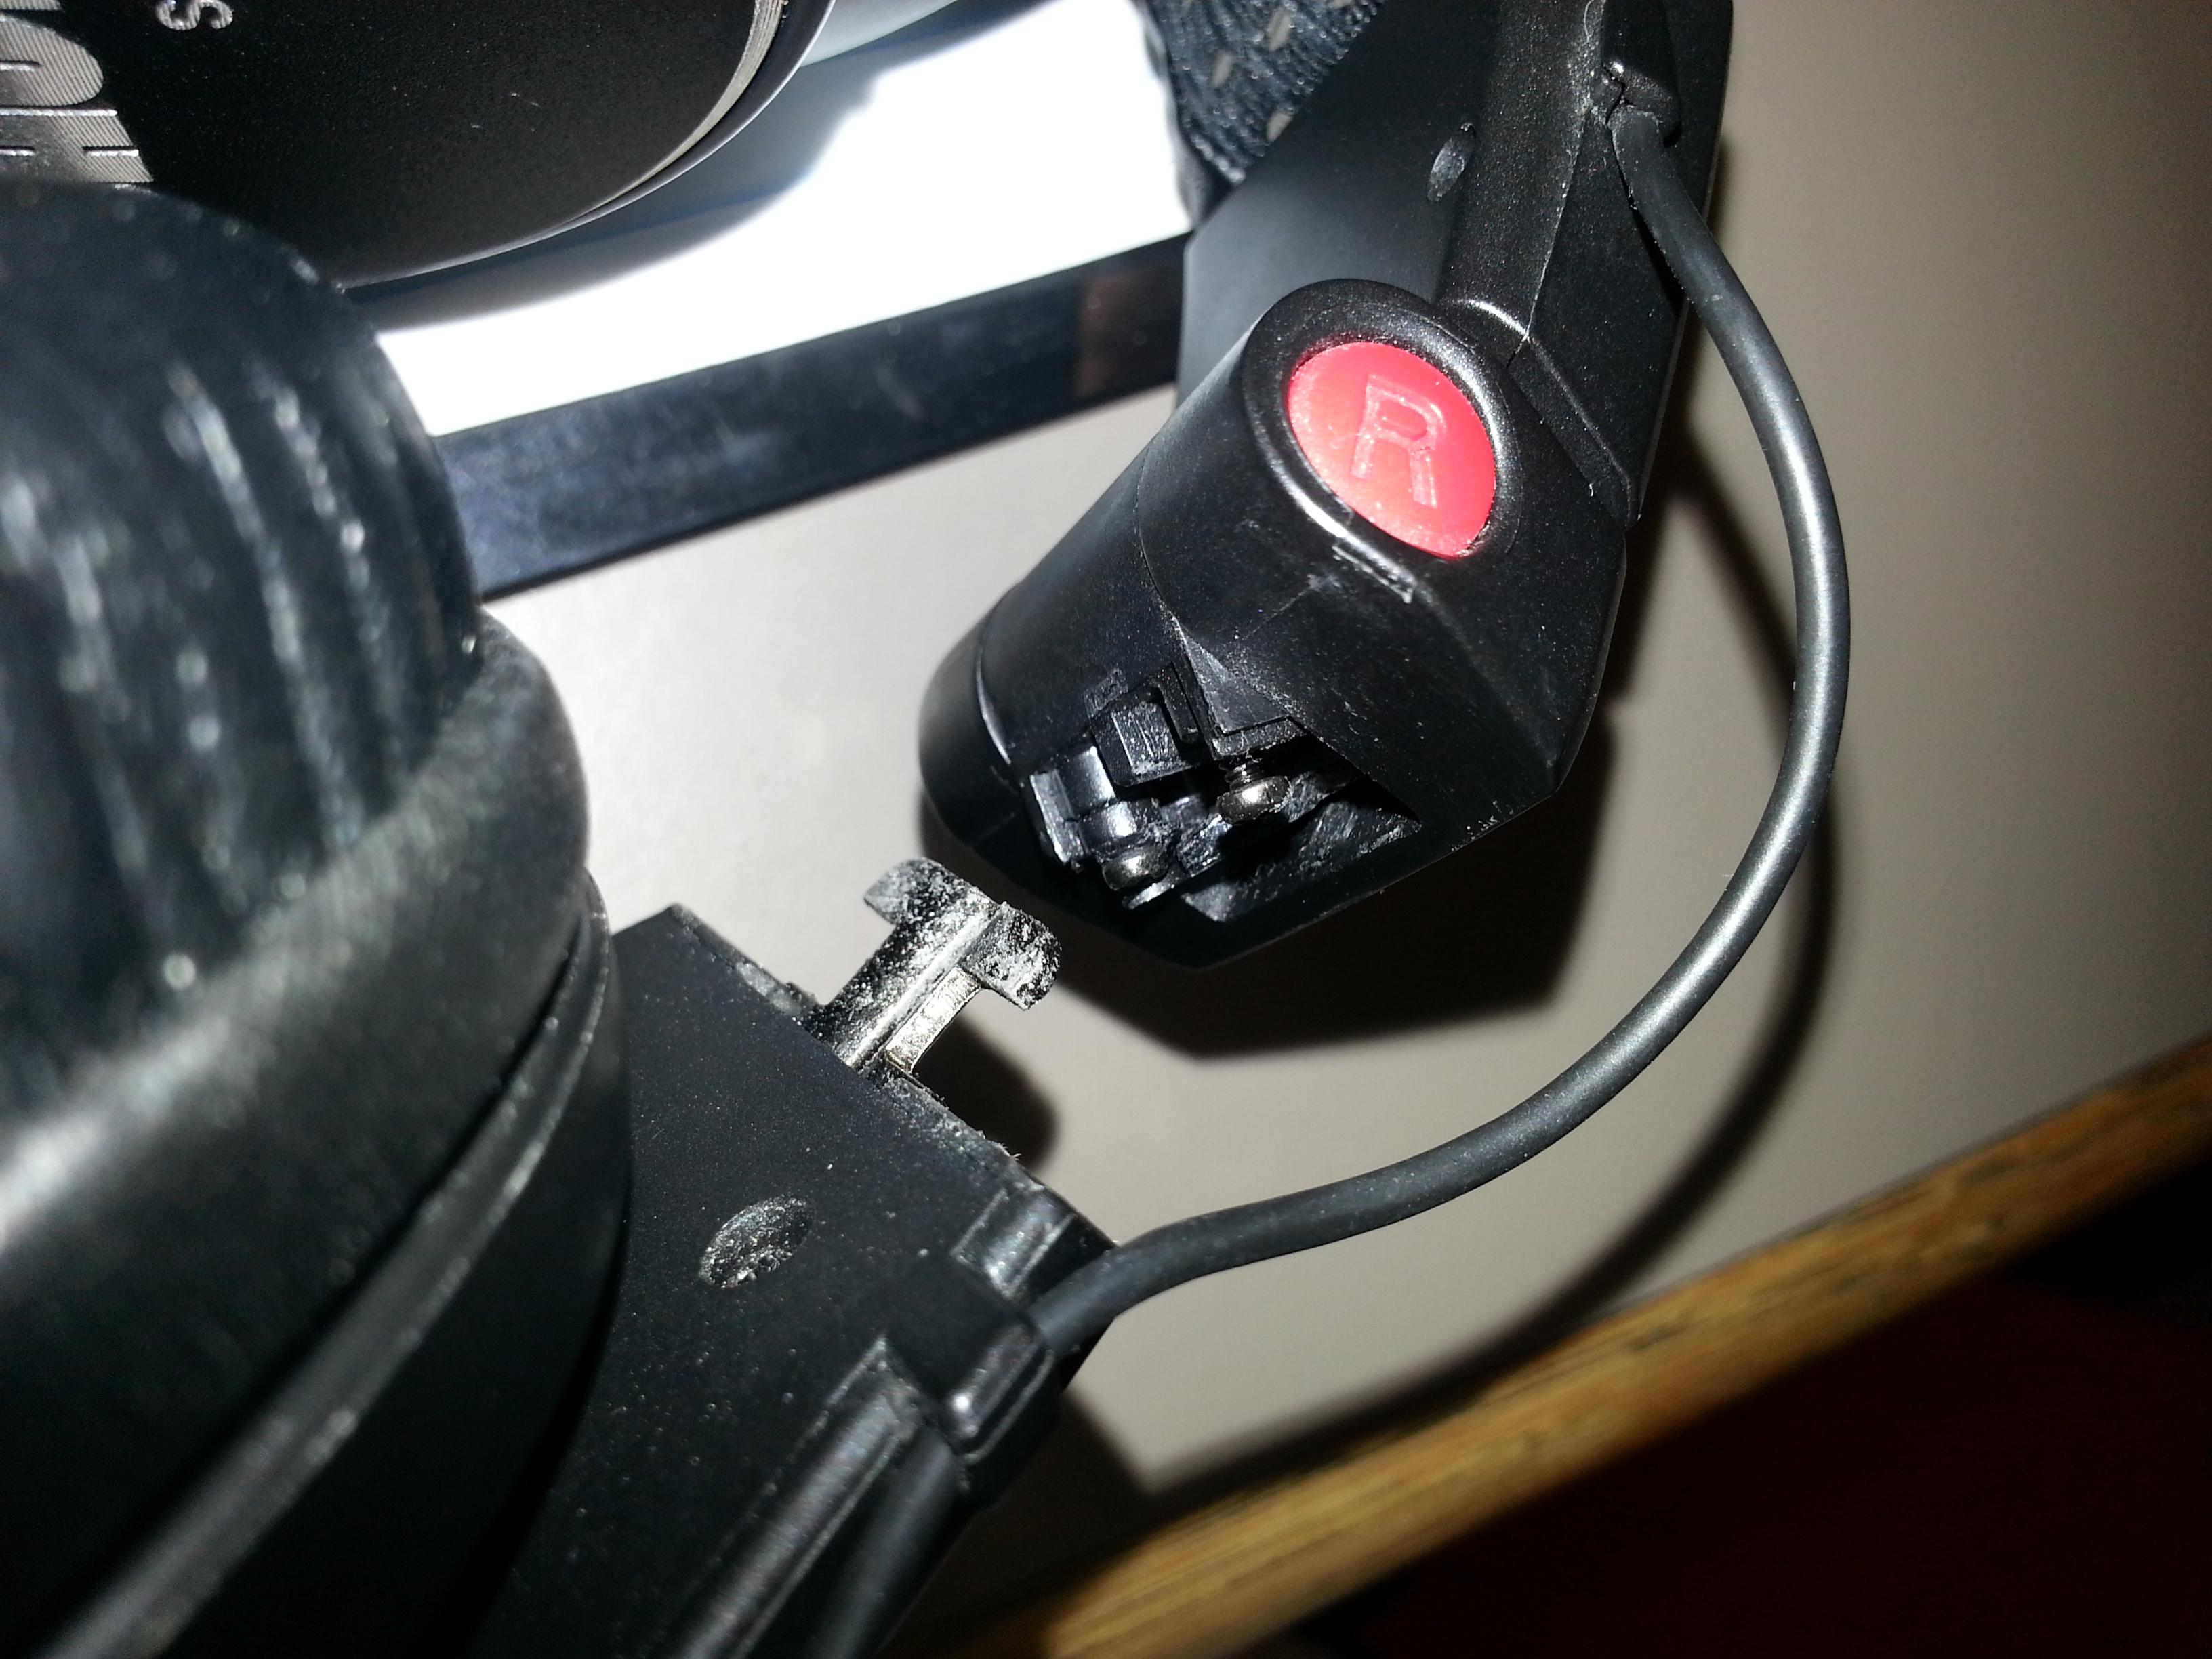 Shure SRH840 broken plastic joint   Head-Fi.org